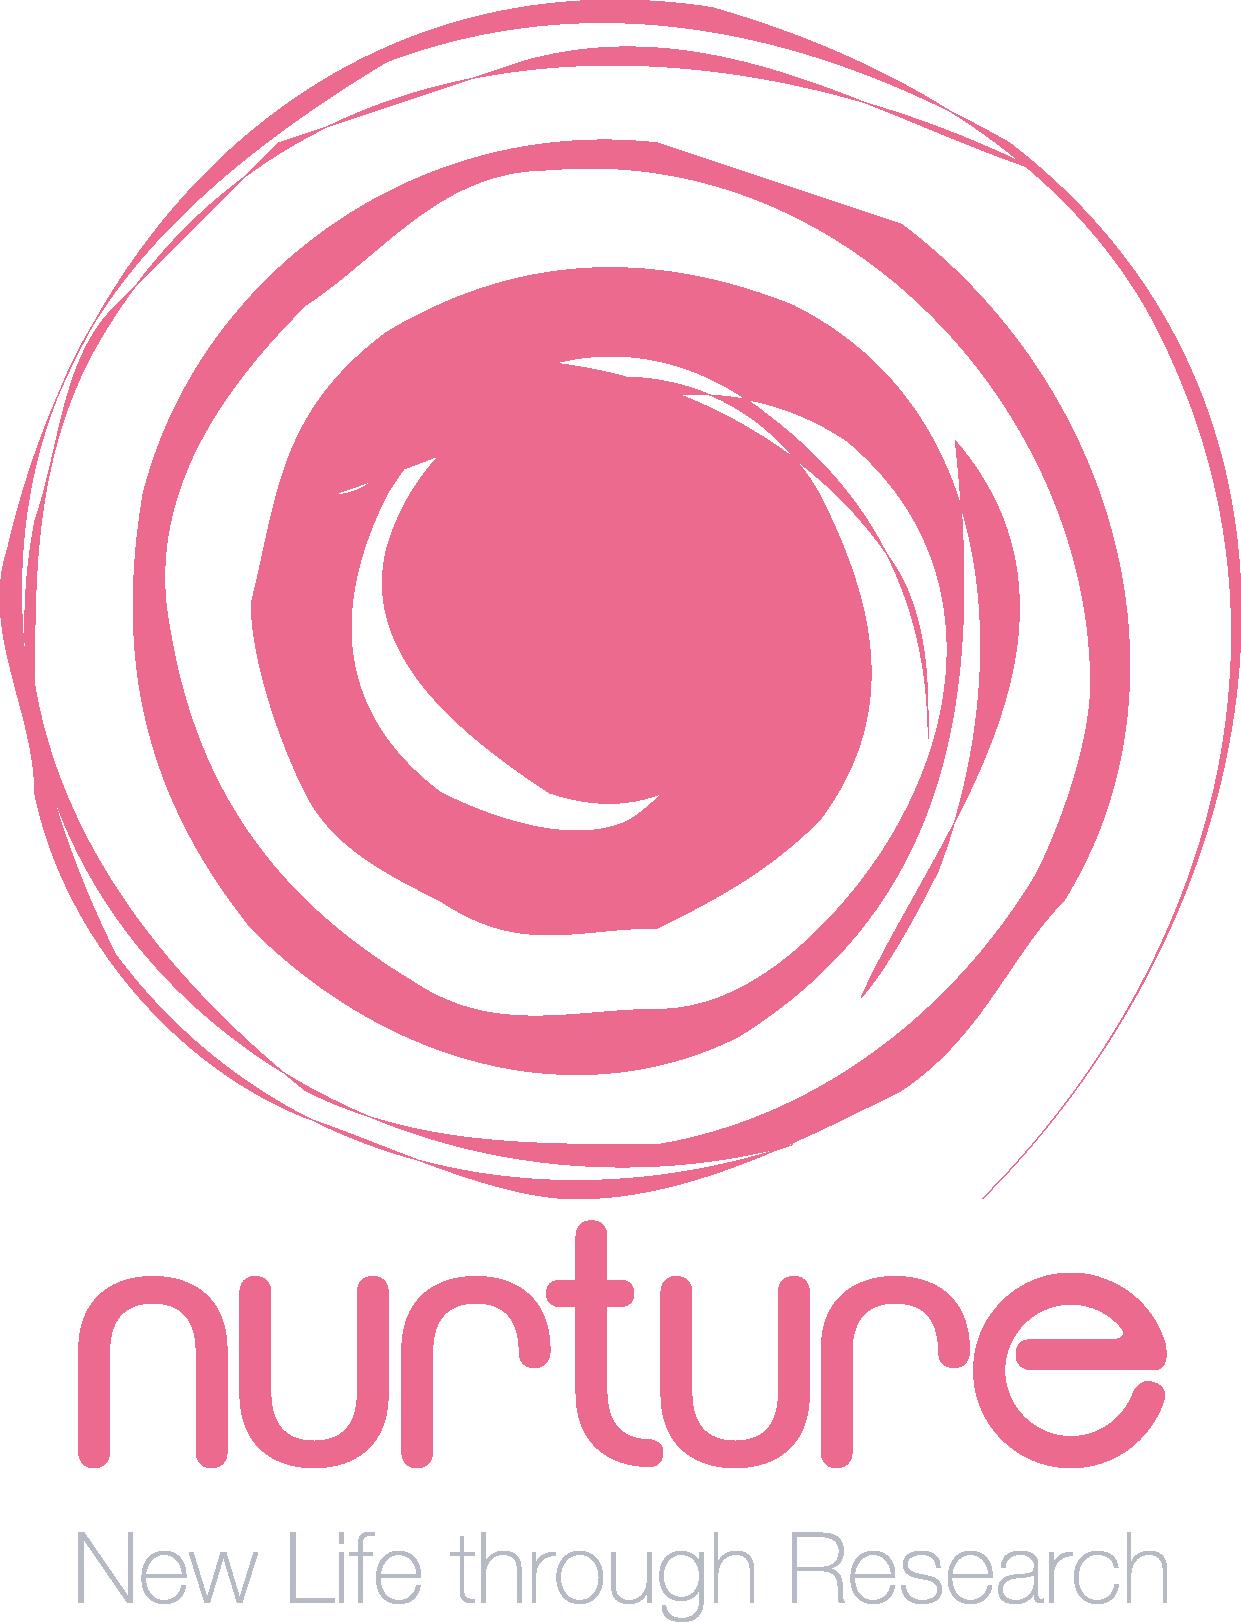 nuture logo